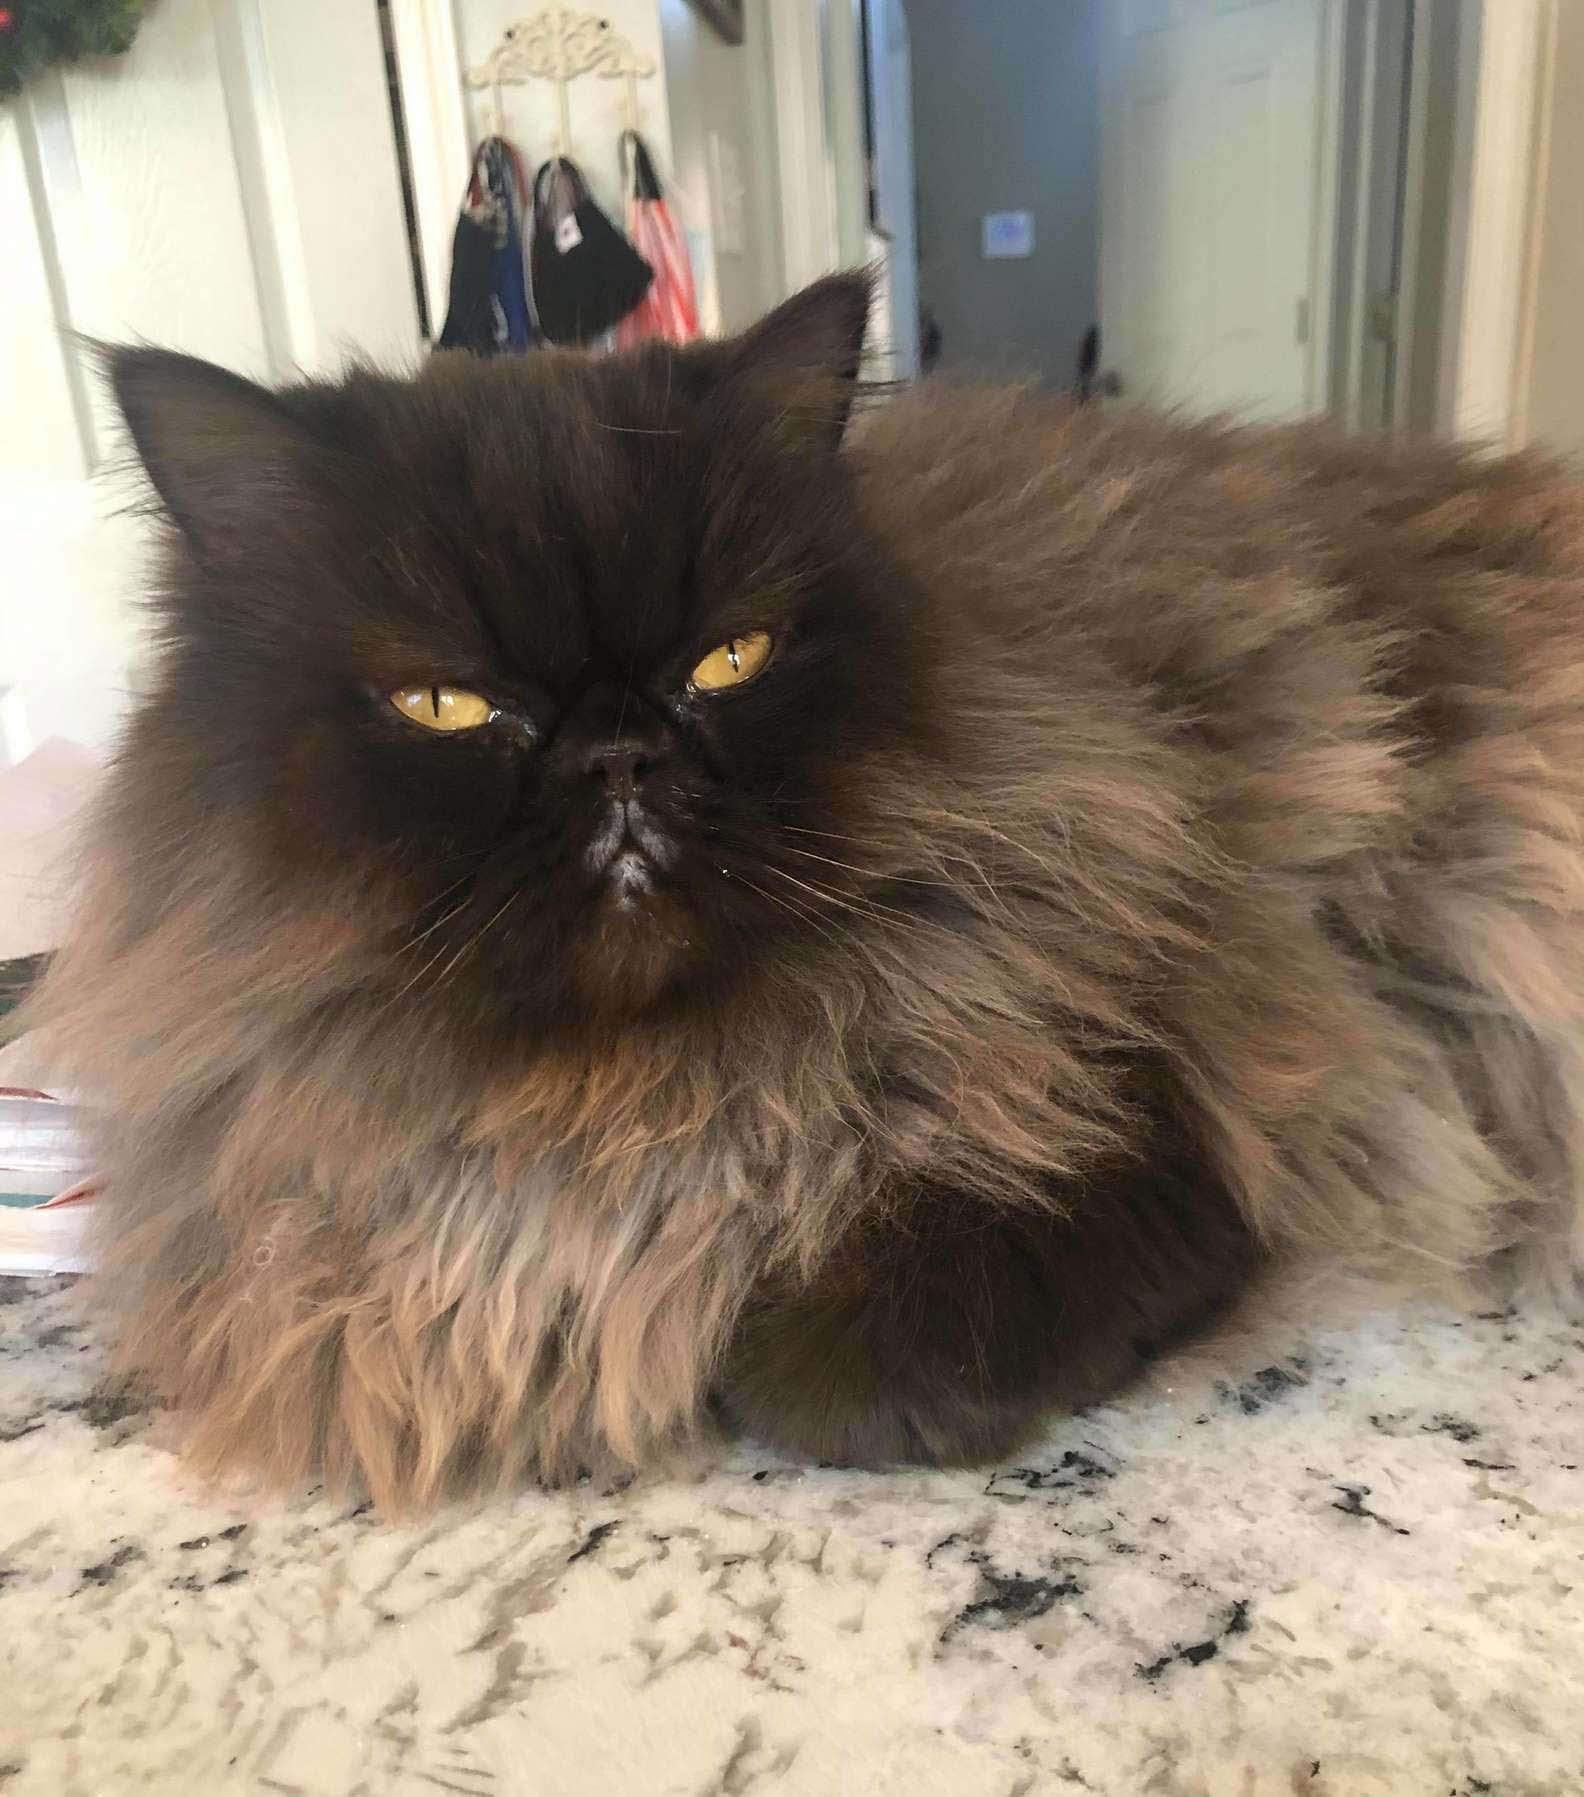 Encantadora gata esponjosa